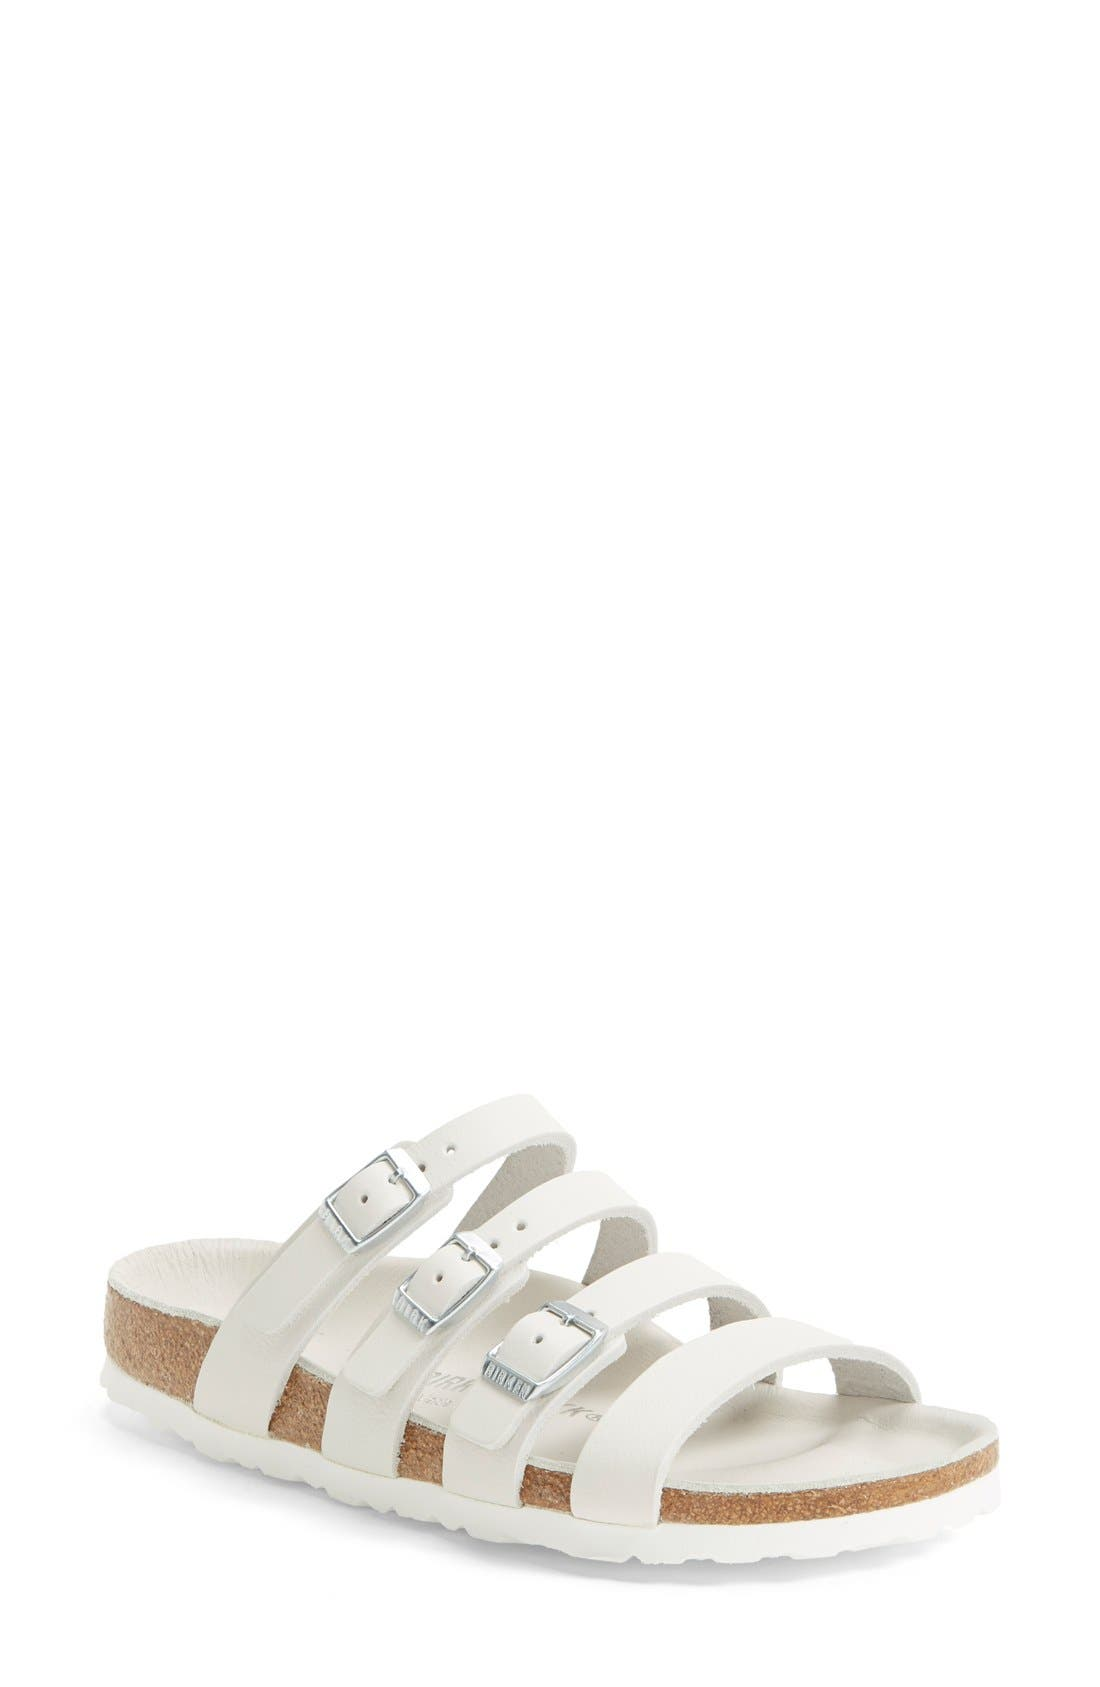 Alternate Image 1 Selected - Birkenstock 'Delmas' Leather Sandal (Women)